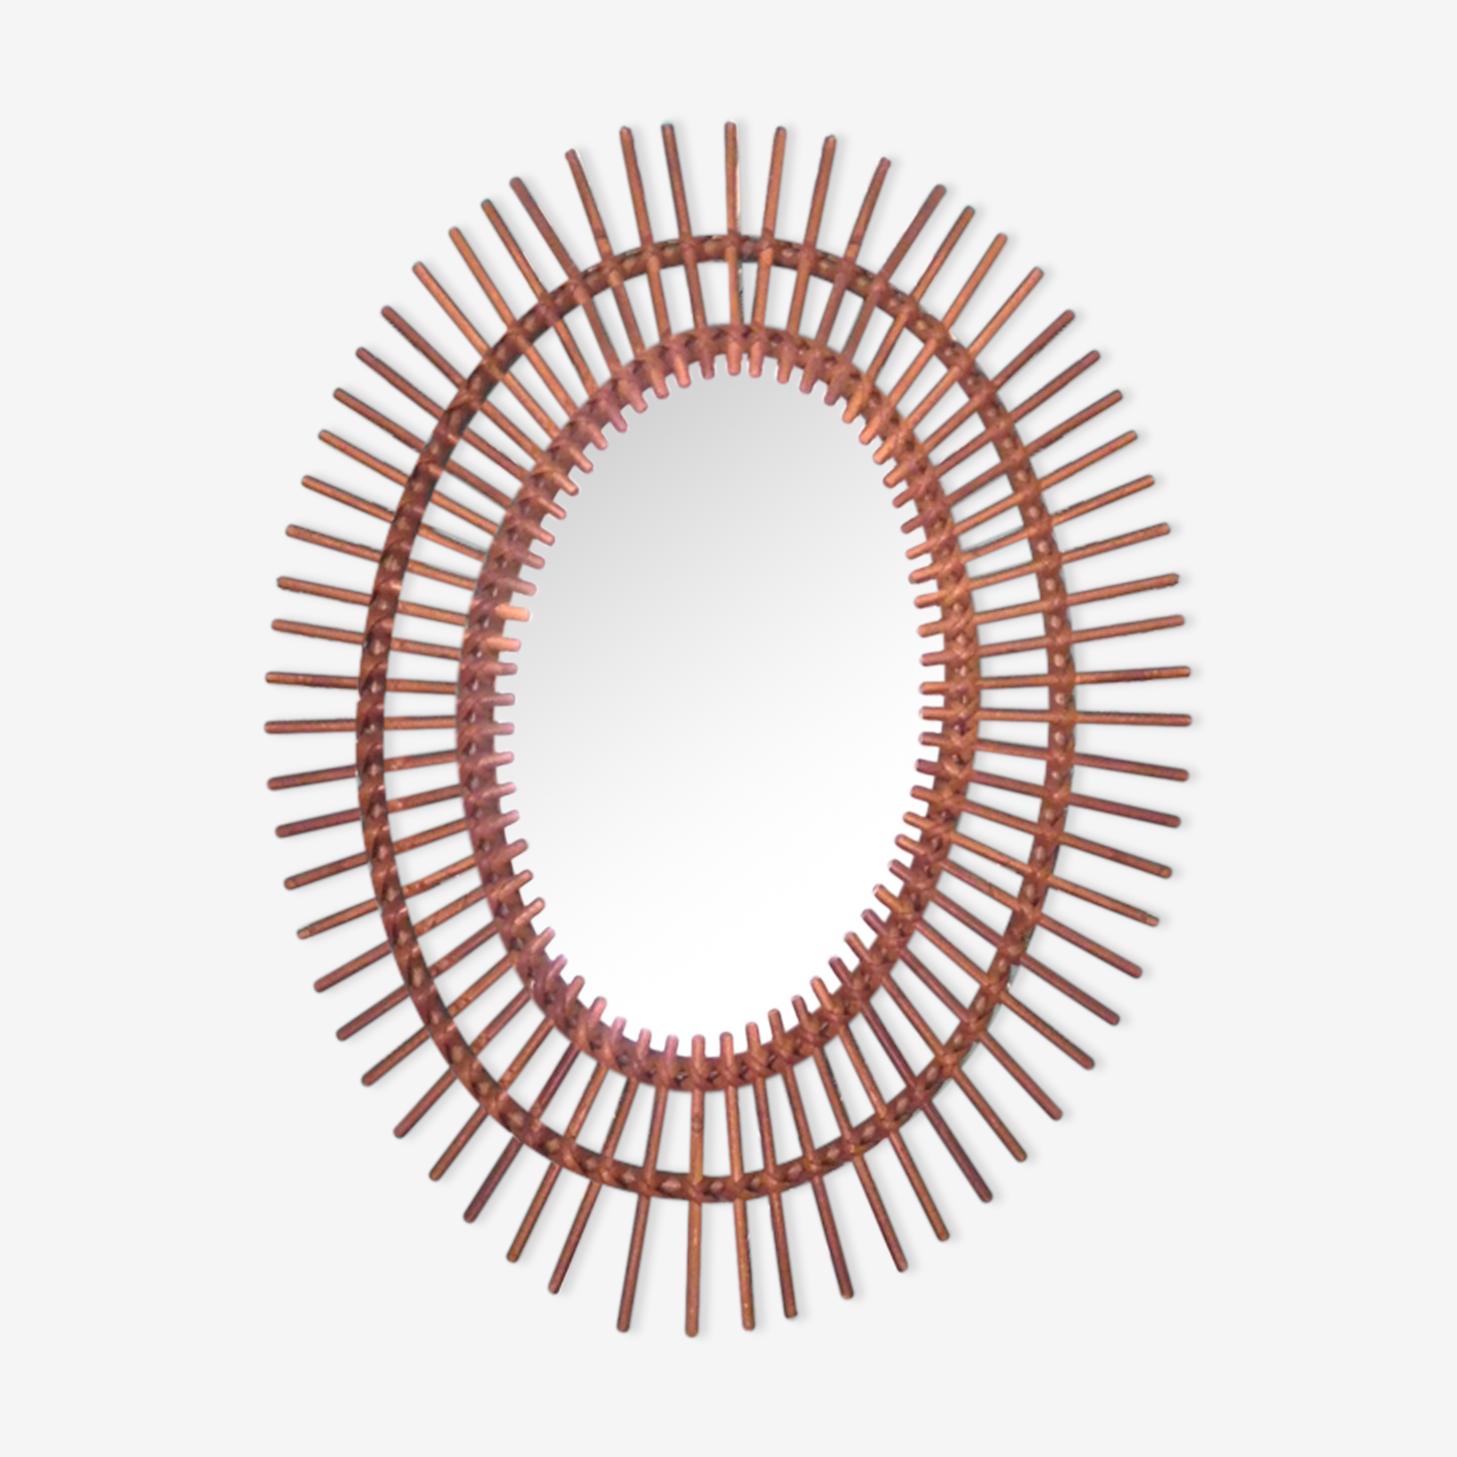 Rattan sunglass mirror 49x61cm